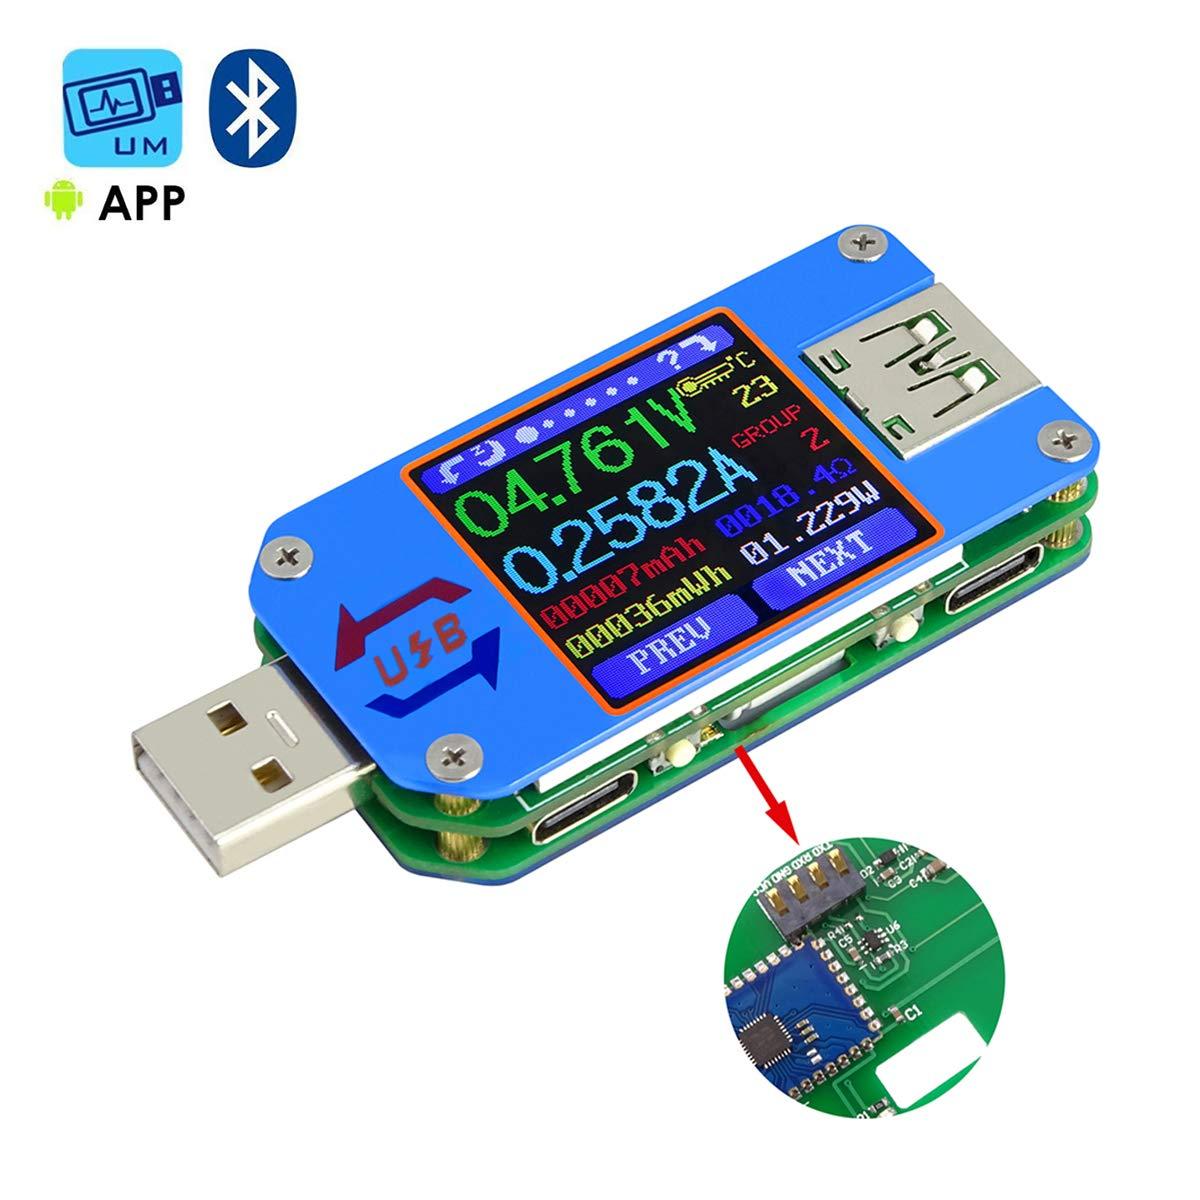 MakerHawk UM25C USB Tester, Bluetooth USB Meter, Type-C Current Meter, USB Power Meter, DC 24.000V 5.0000A, USB Cable Tester, 1.44 inch Color LCD Multimeter, Voltage Tester, USB Load, QC 2.0 QC 3.0